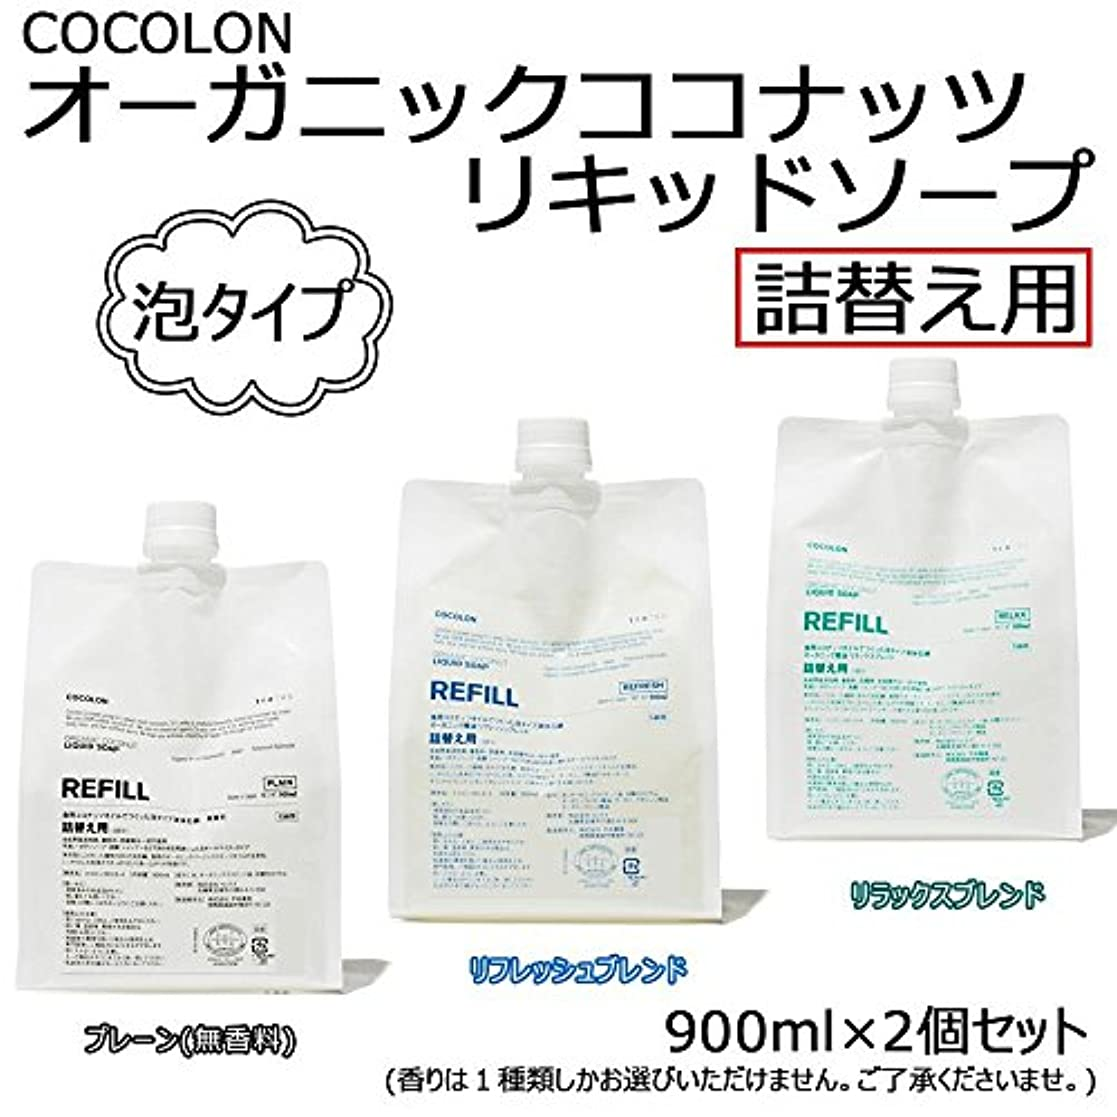 COCOLON ココロン オーガニックココナッツリキッドソープ 泡タイプ 詰替え用 900ml 2個セット【同梱?代引不可】 ■3種類の内「リラックスブレンド」のみです